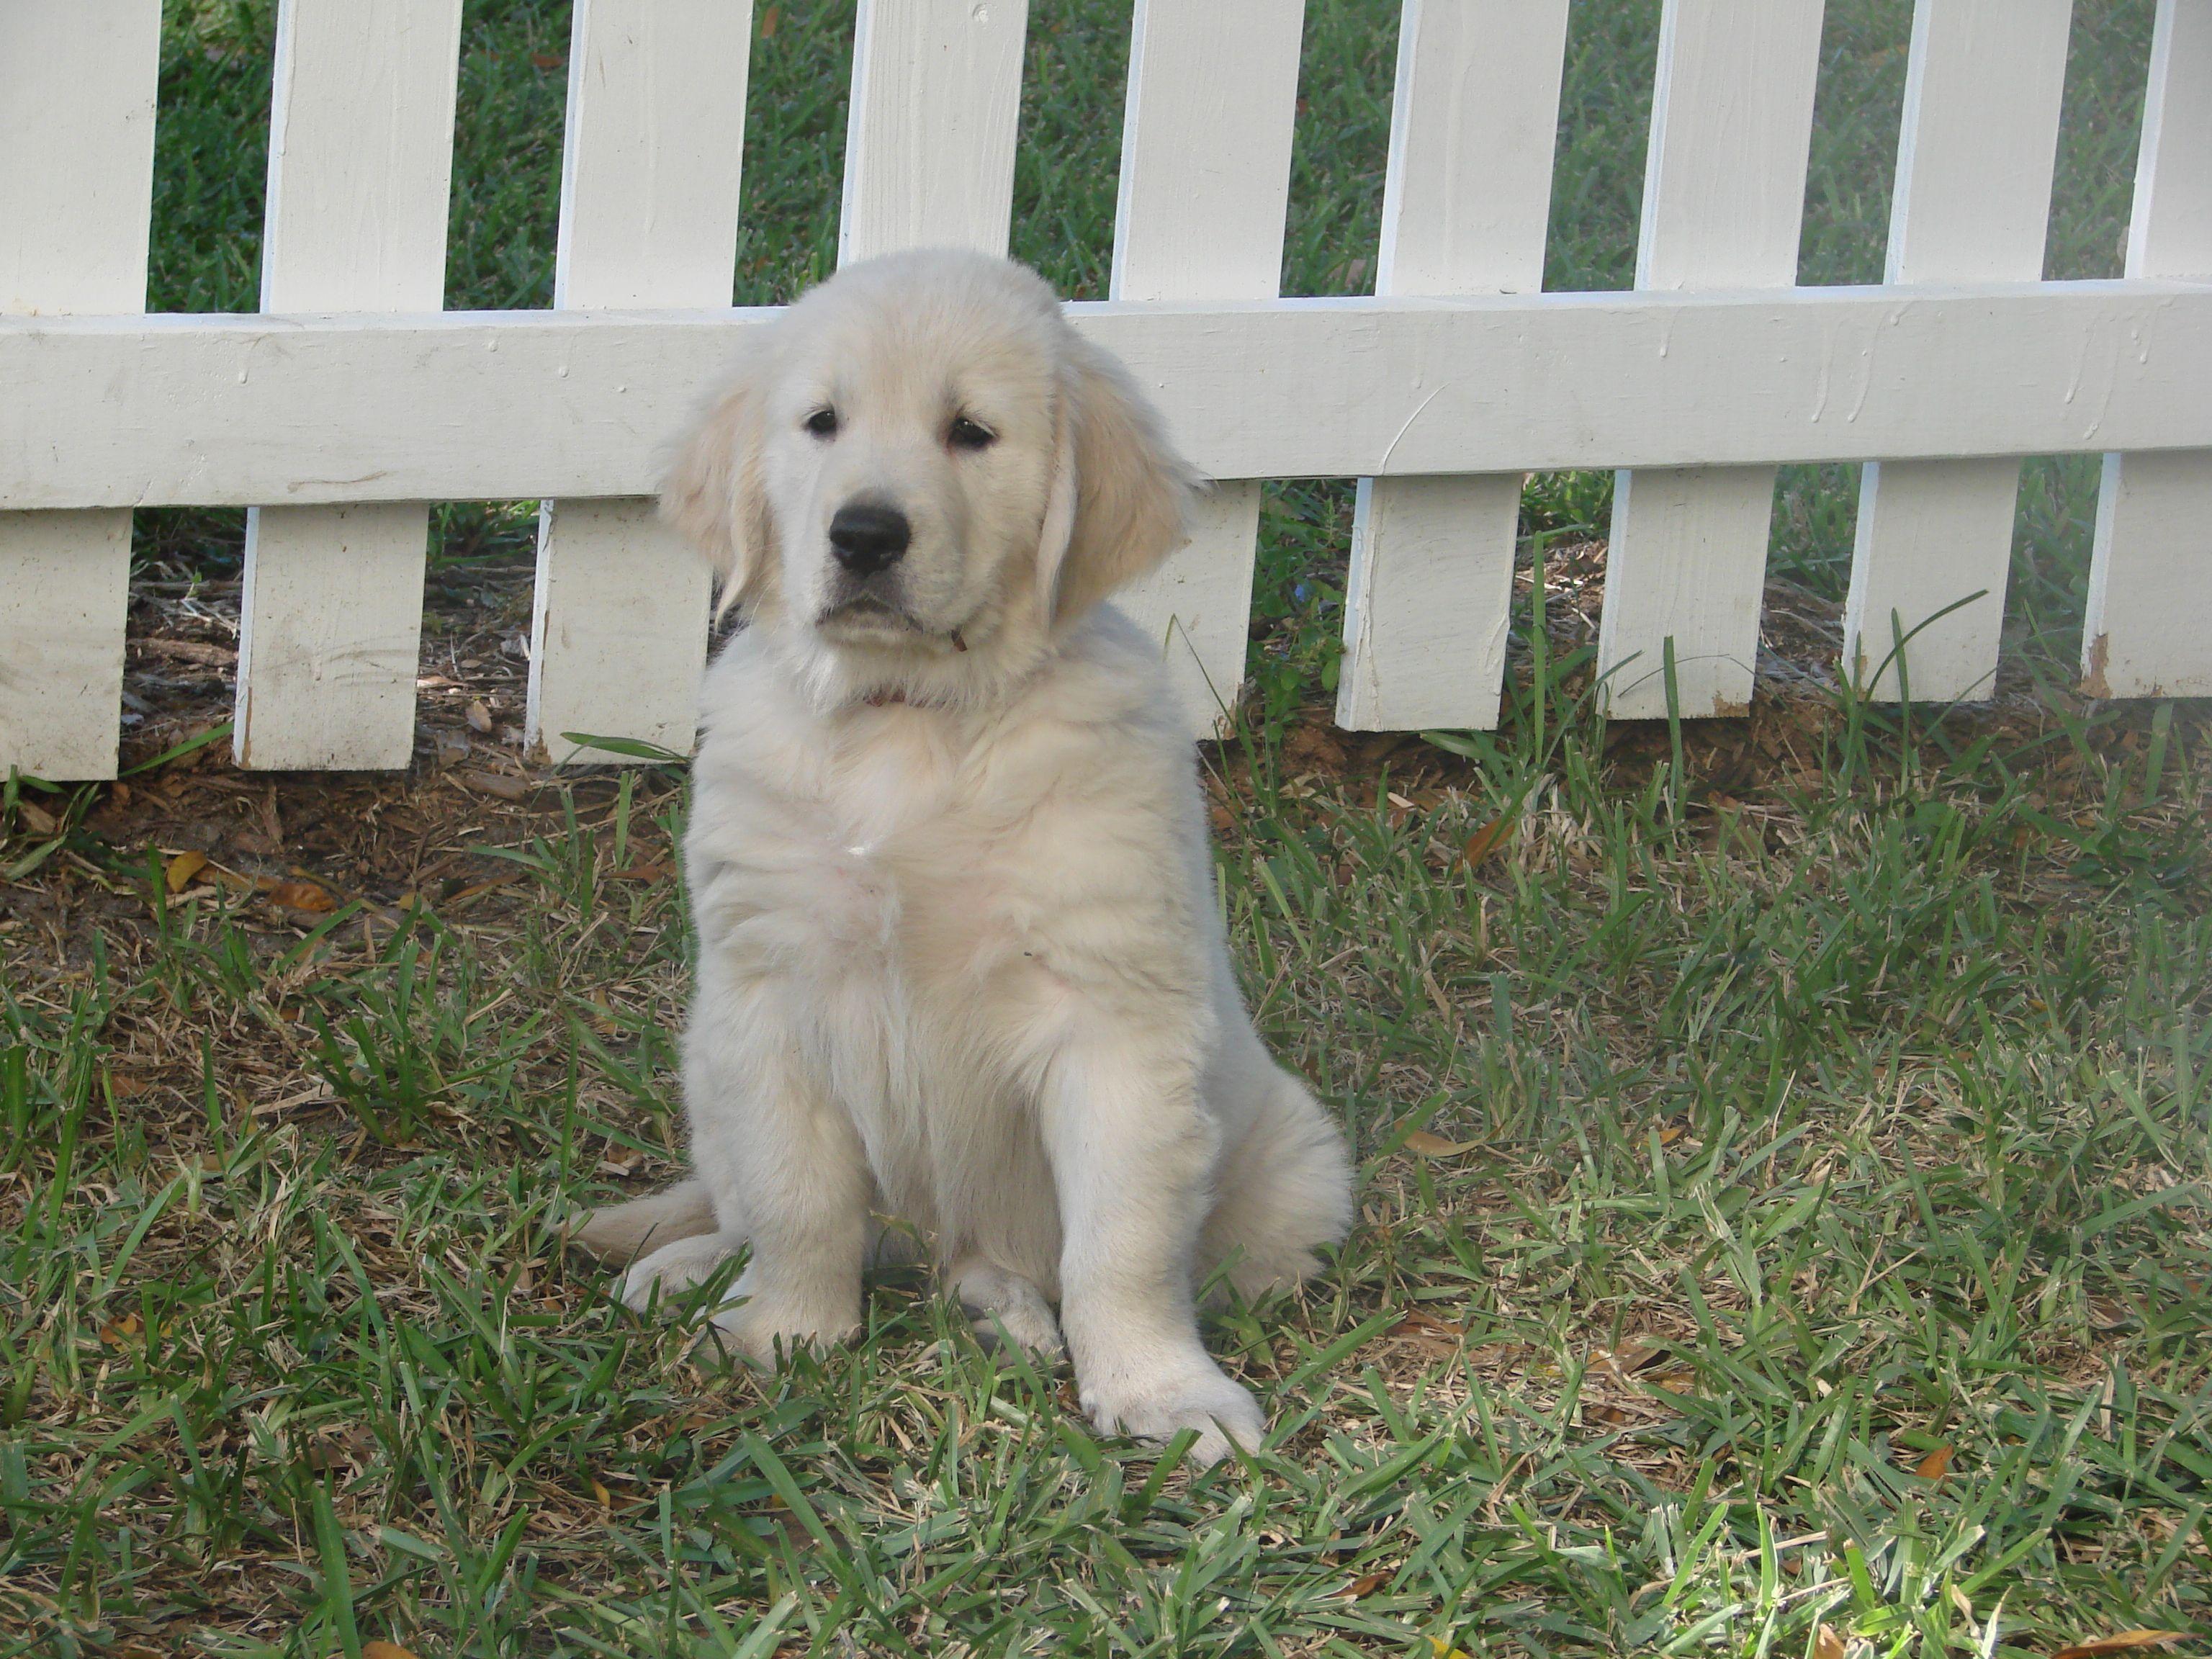 My Dog Burly At 8 Weeks An English Cream Golden Retriever